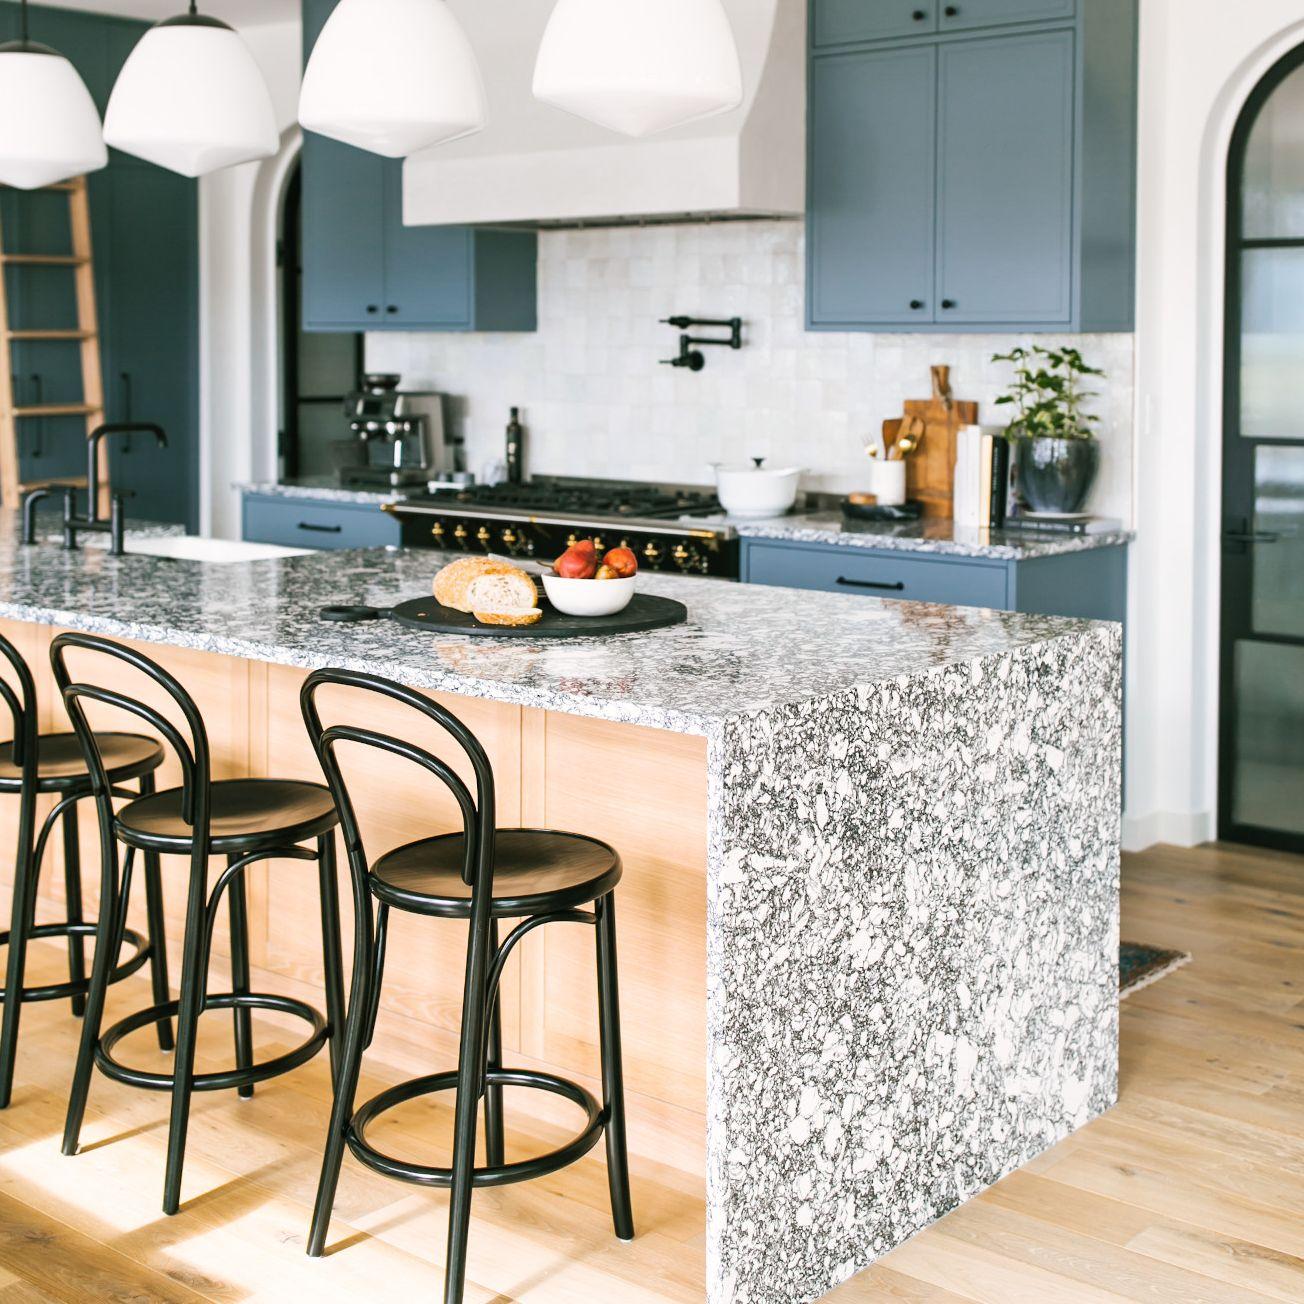 Cambria-quartz-countertop-kitchen-RoseBay